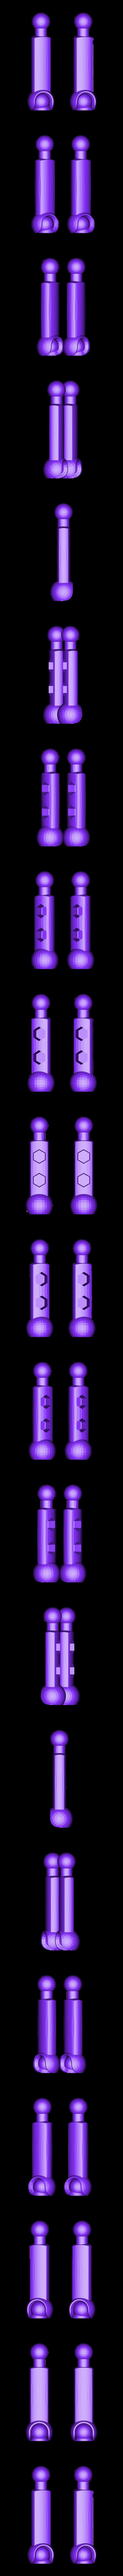 "modibot-remix-legs-upper.stl Download free STL file Modibot action figure ""easy print"" remix • 3D printer design, firebird"